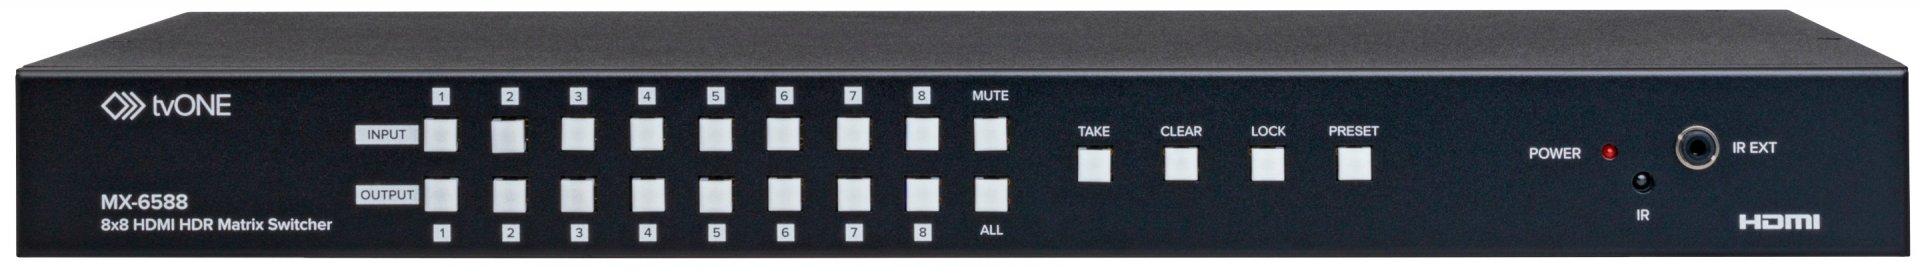 MX-6588_front